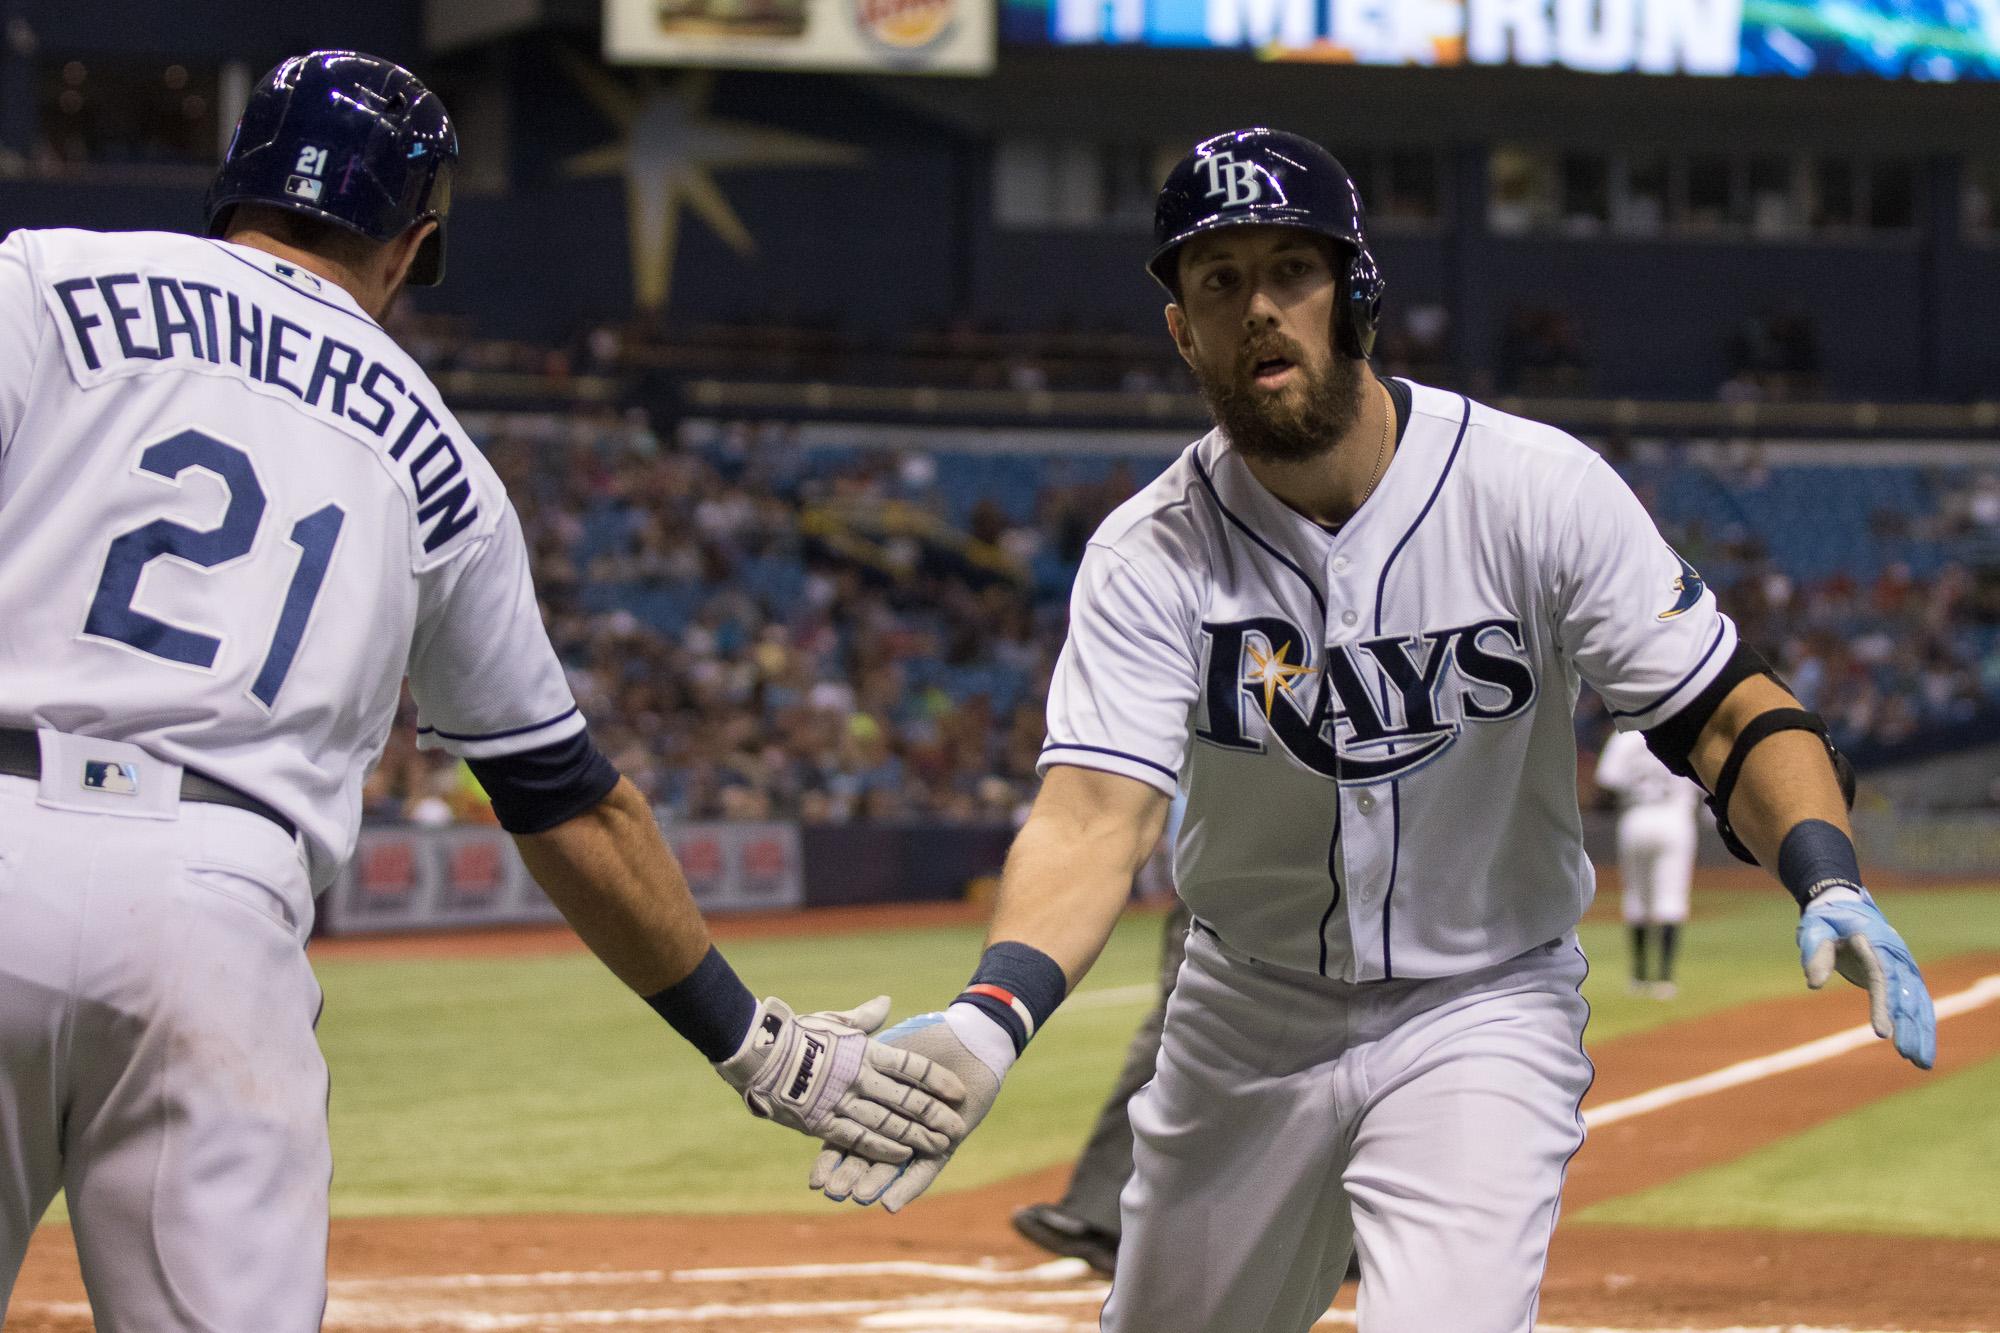 Souza Jr. celebrates his 14th homer./STEVEN MUNCIE